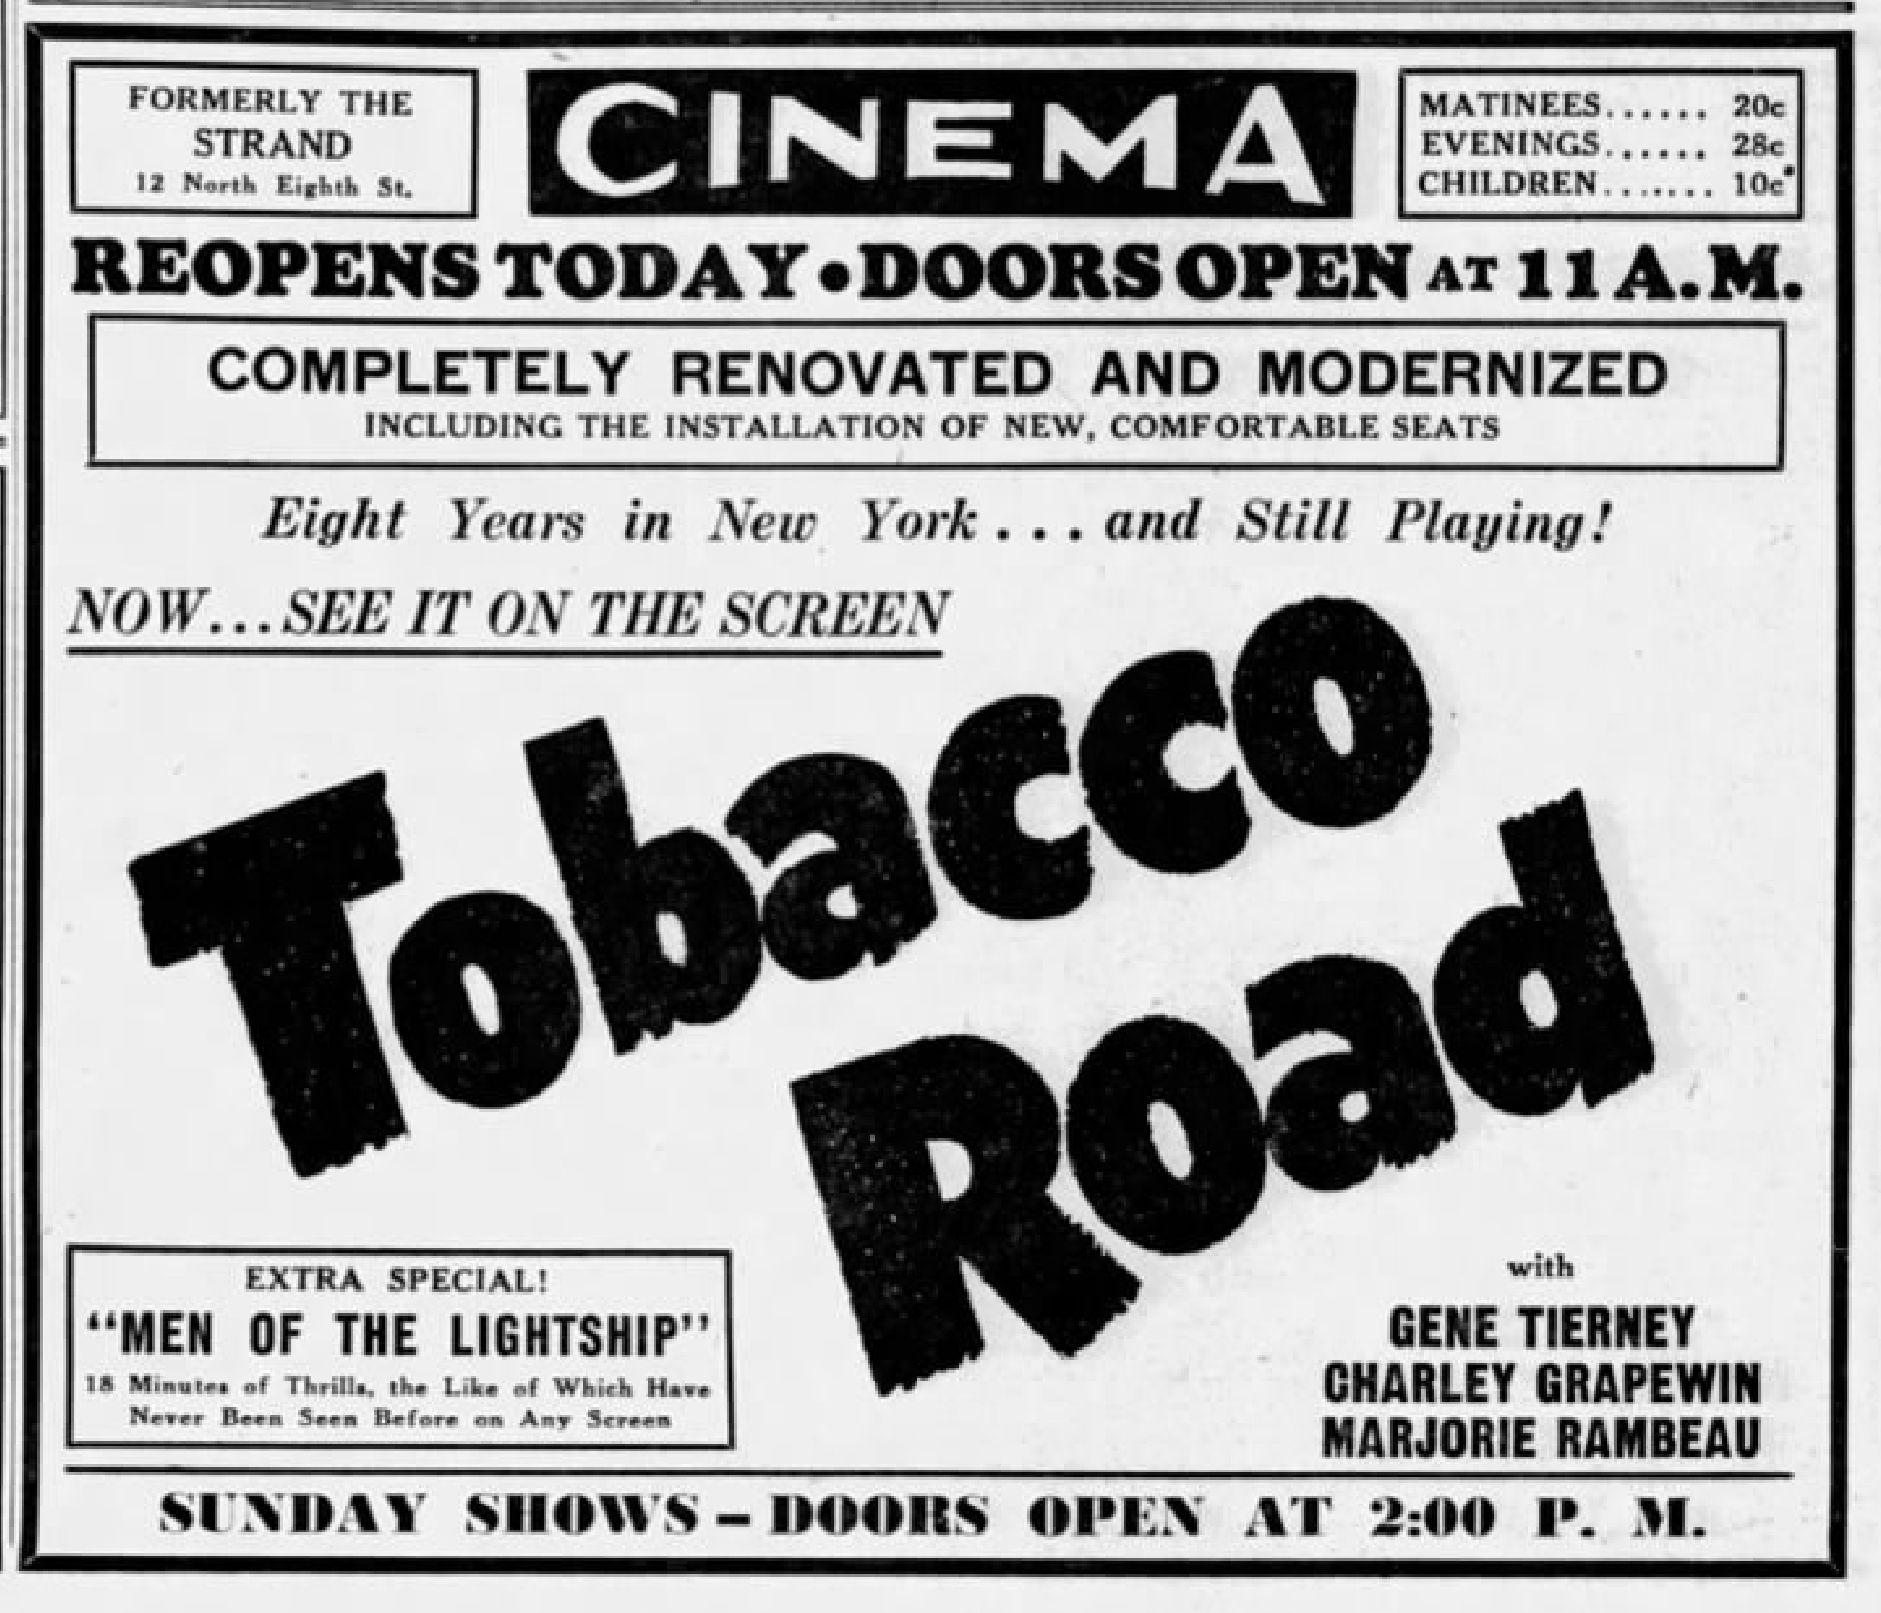 File:1941 - Cinema Theater - First - 12 Aor MC - Allentown PA jpg